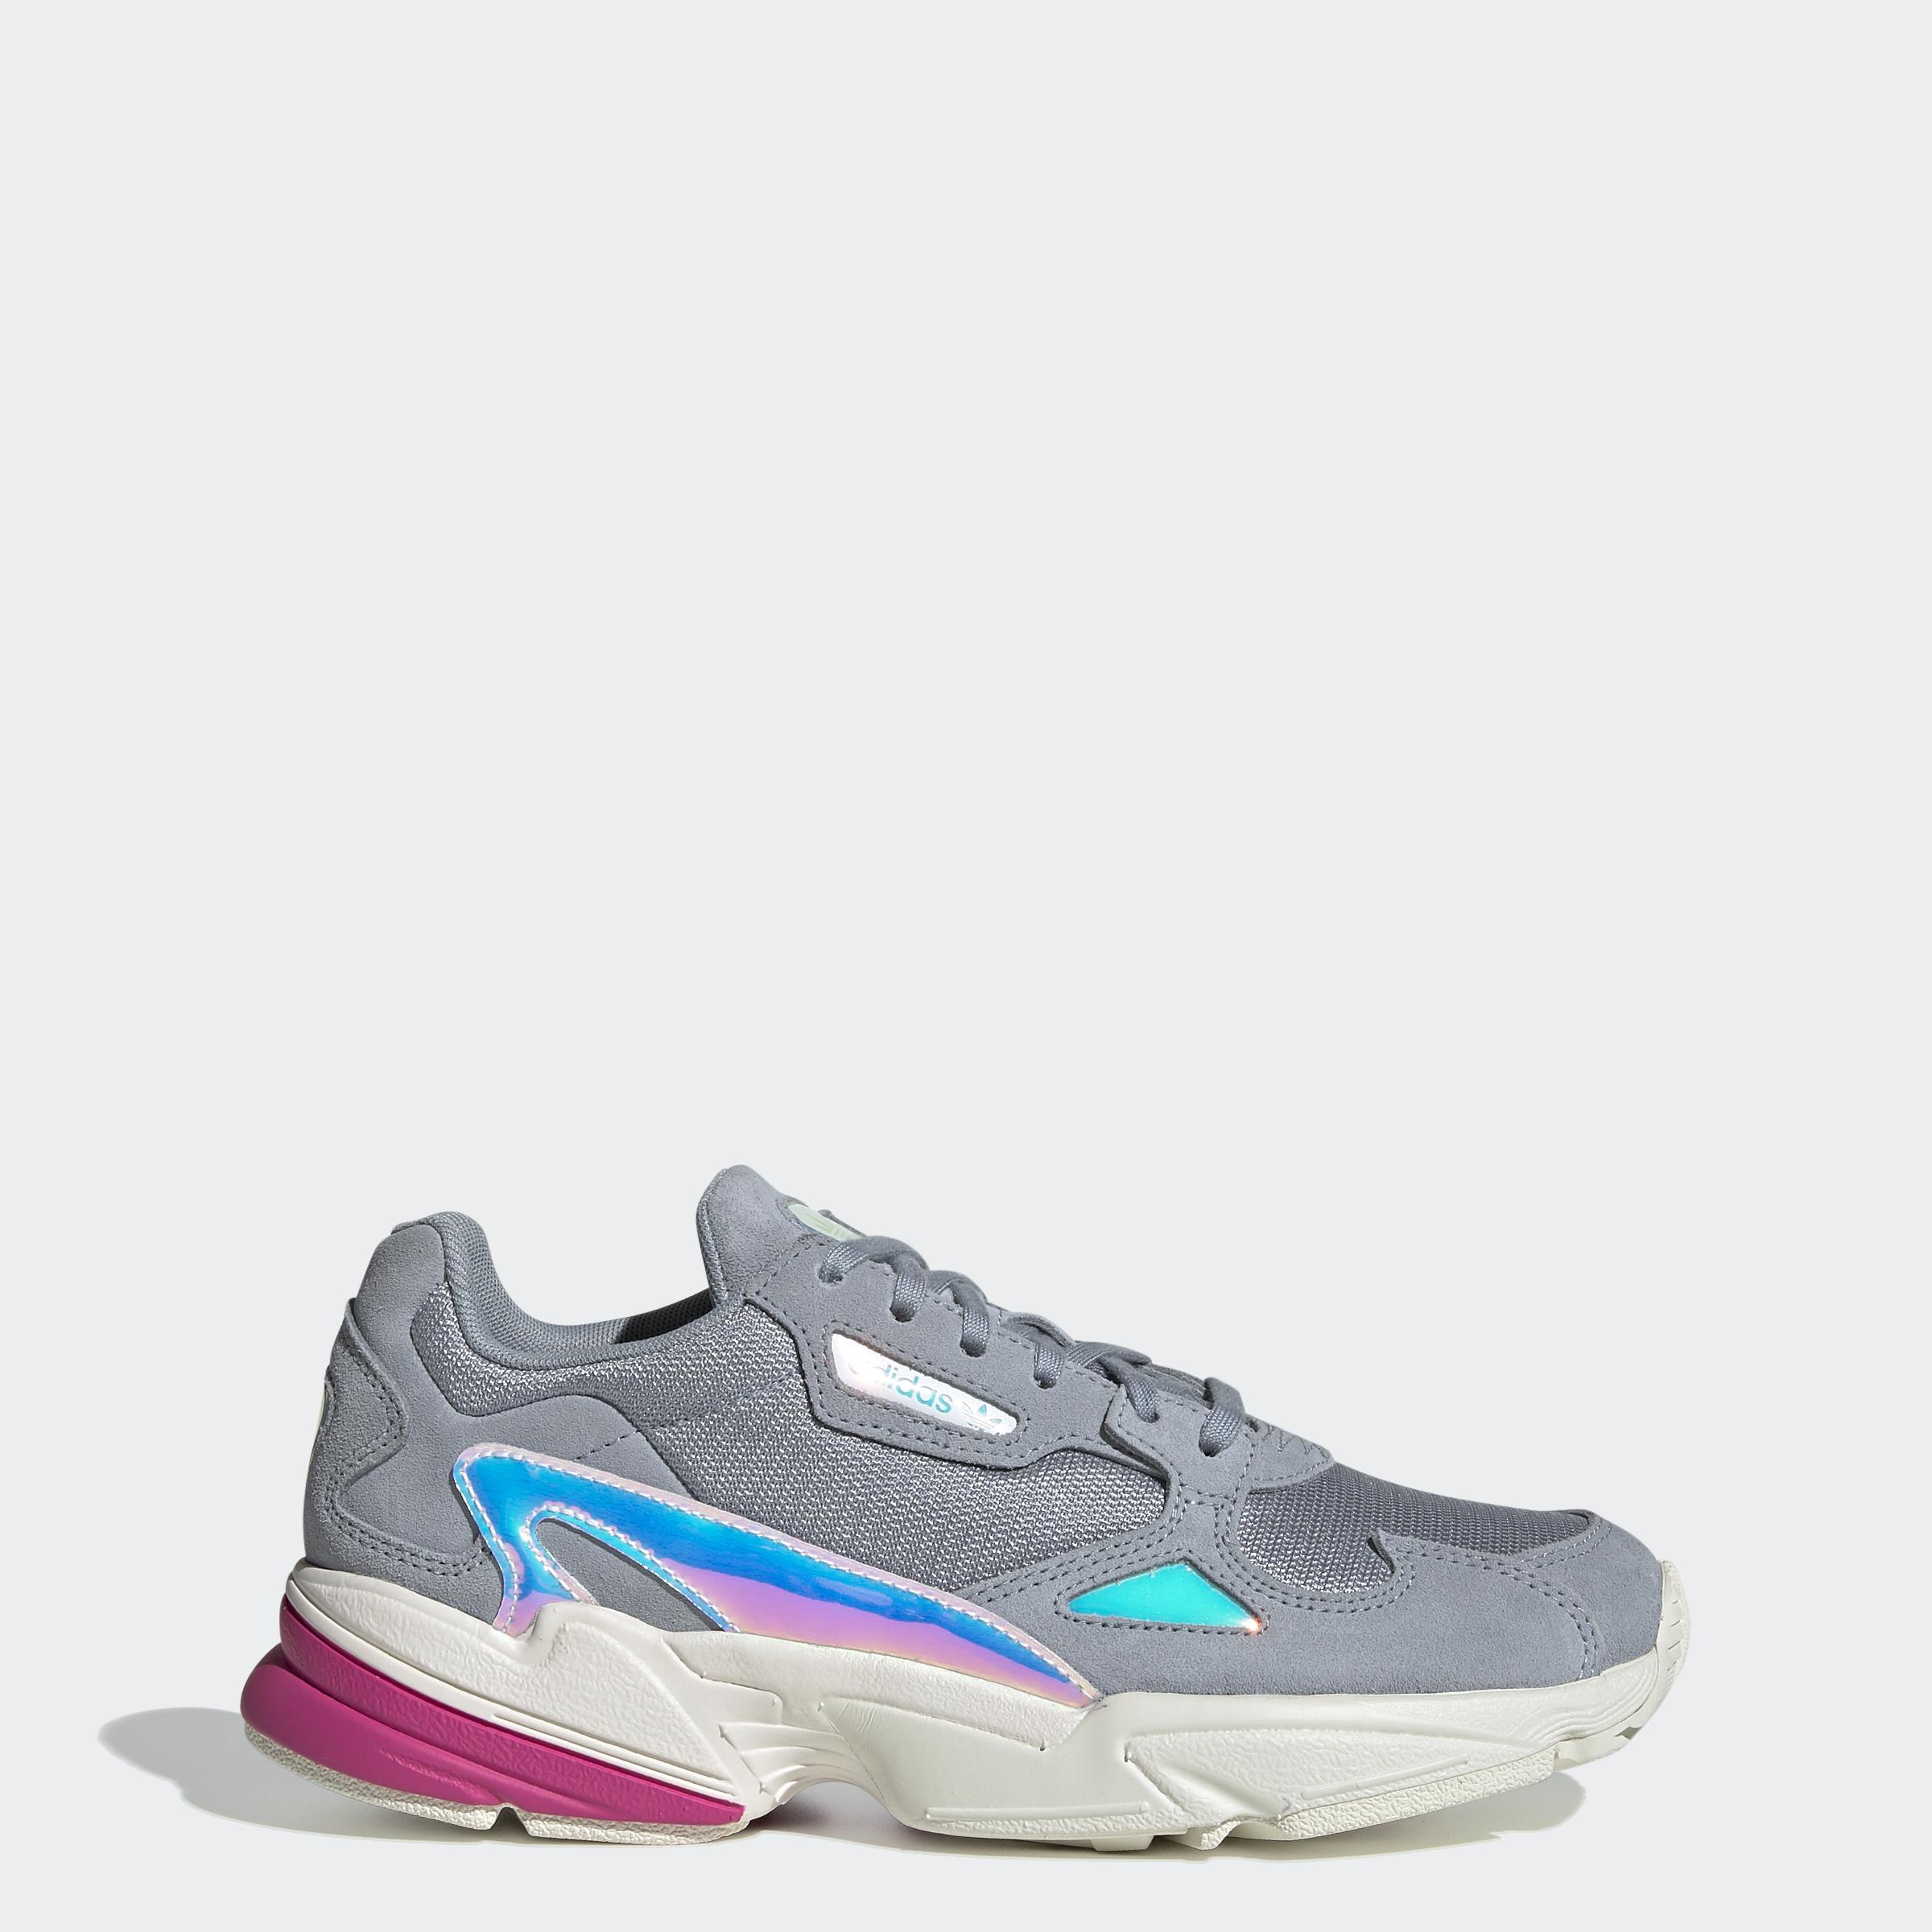 adidas-Originals-Falcon-Shoes-Women-039-s thumbnail 73